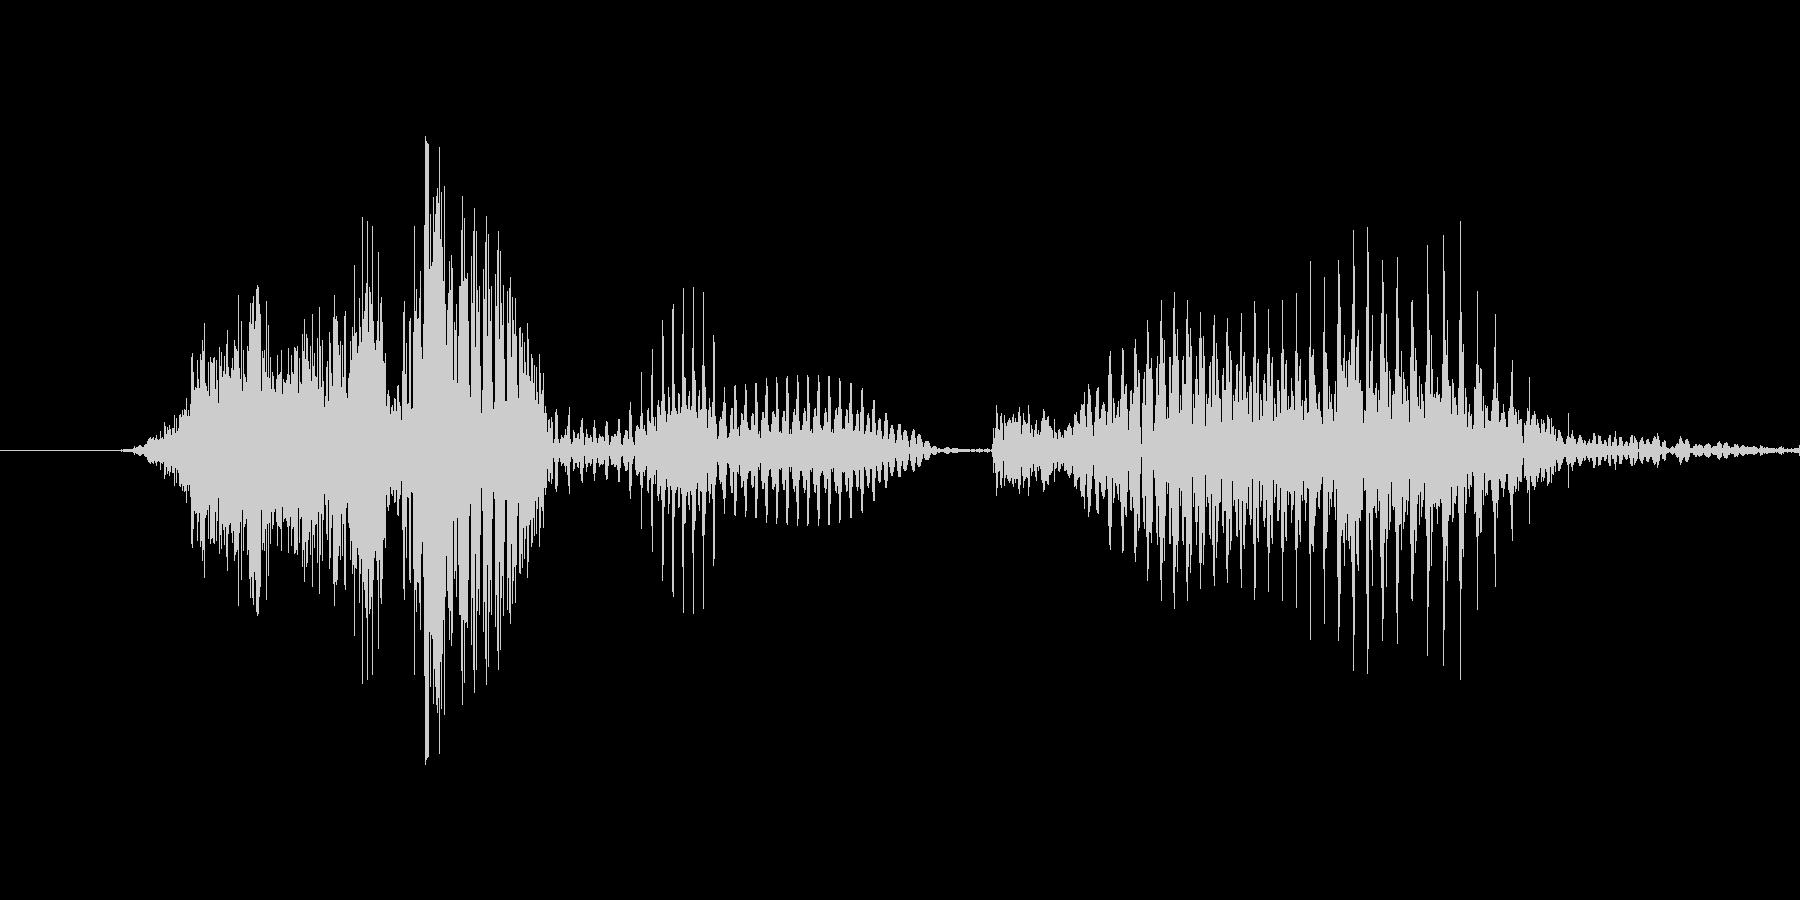 「7 PM」英語発音の未再生の波形